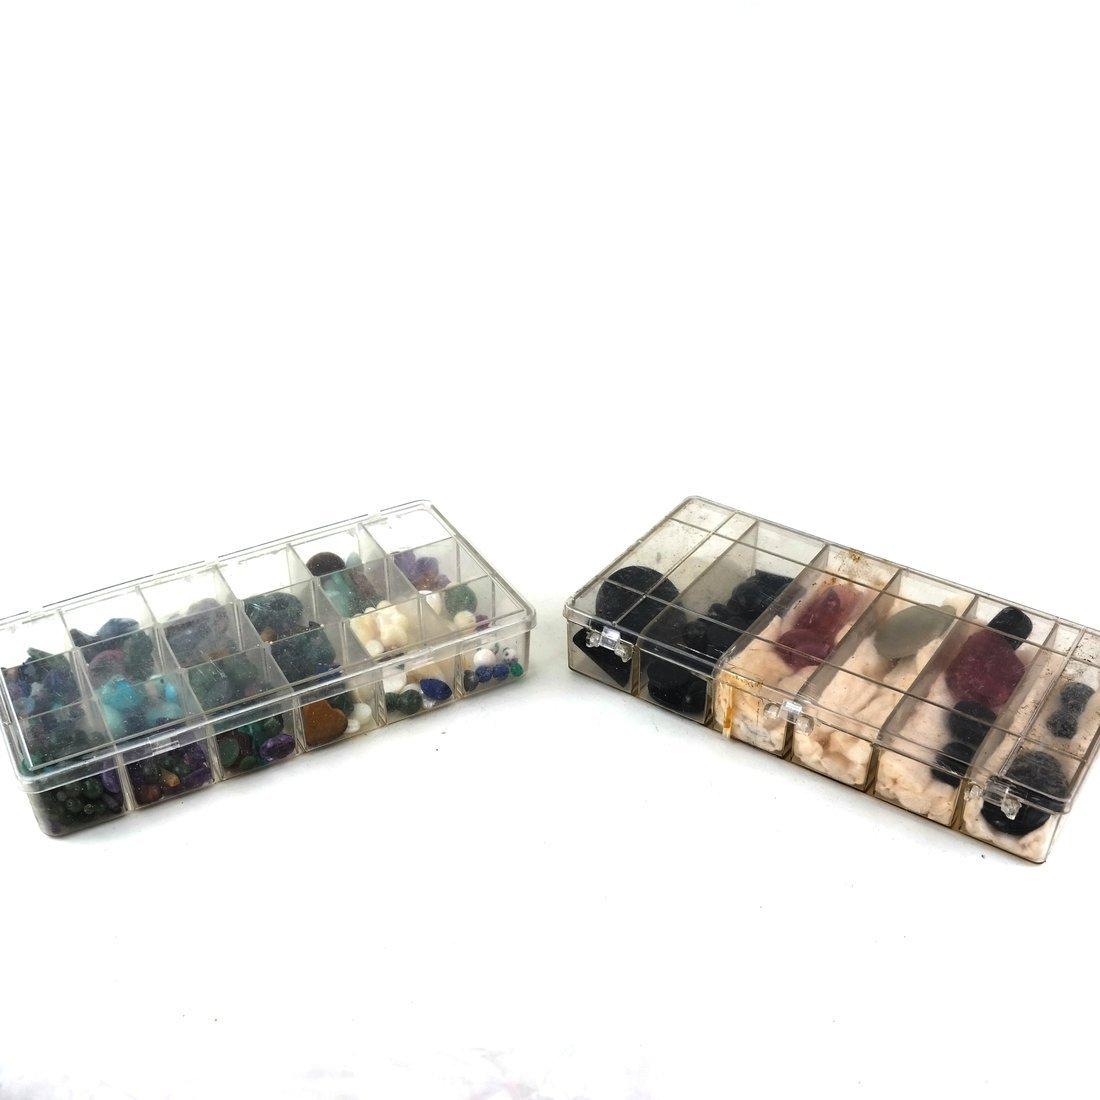 Two Boxes of Mixed Semi-Precious Stones